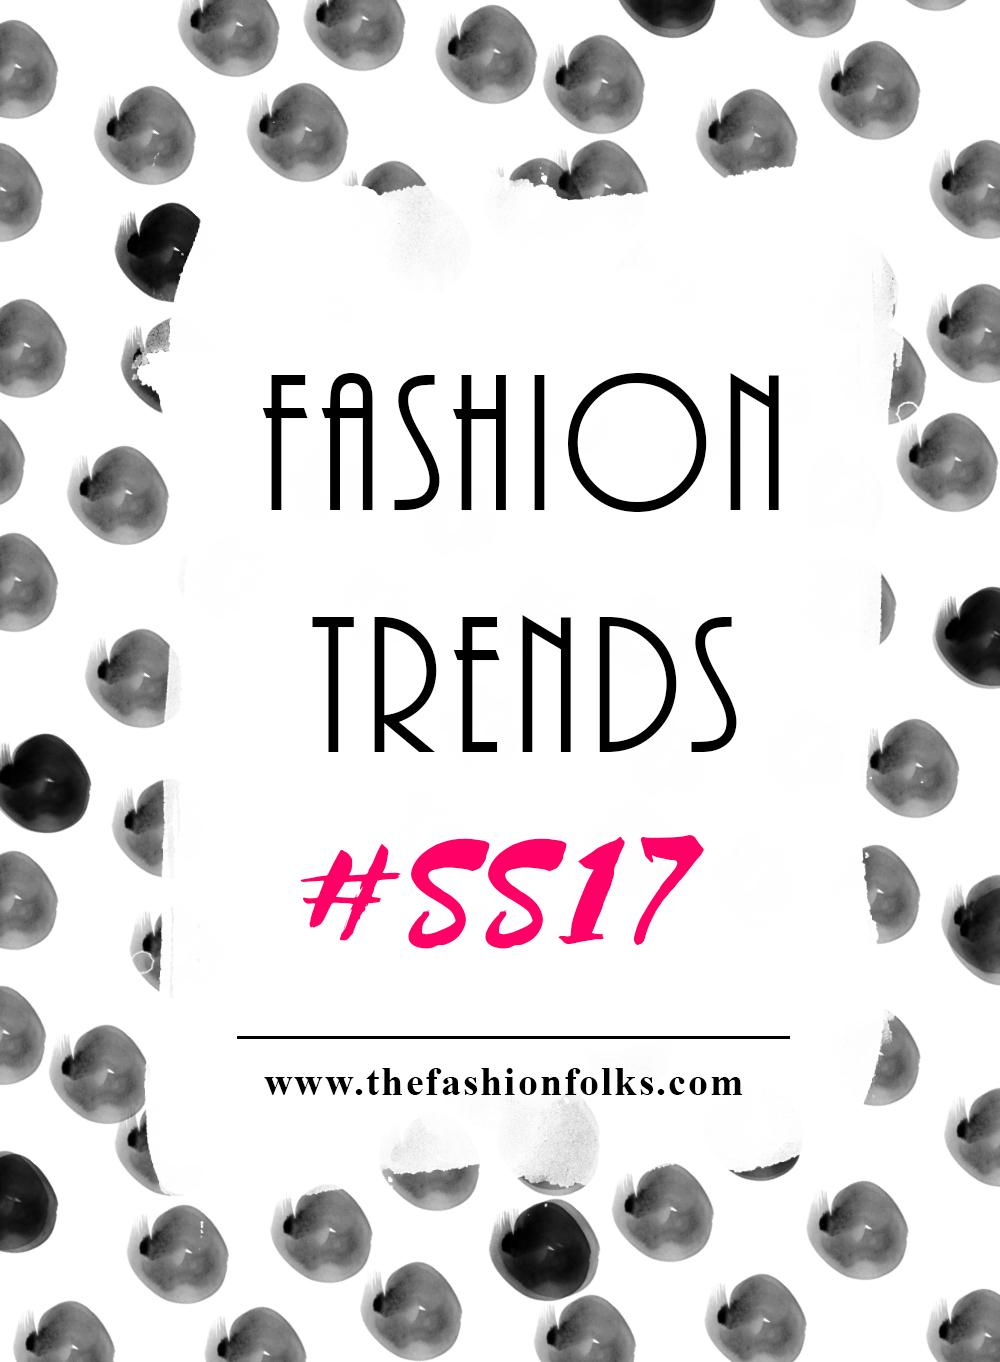 Fashion Trends Spring 2017 | The Fashion Folks